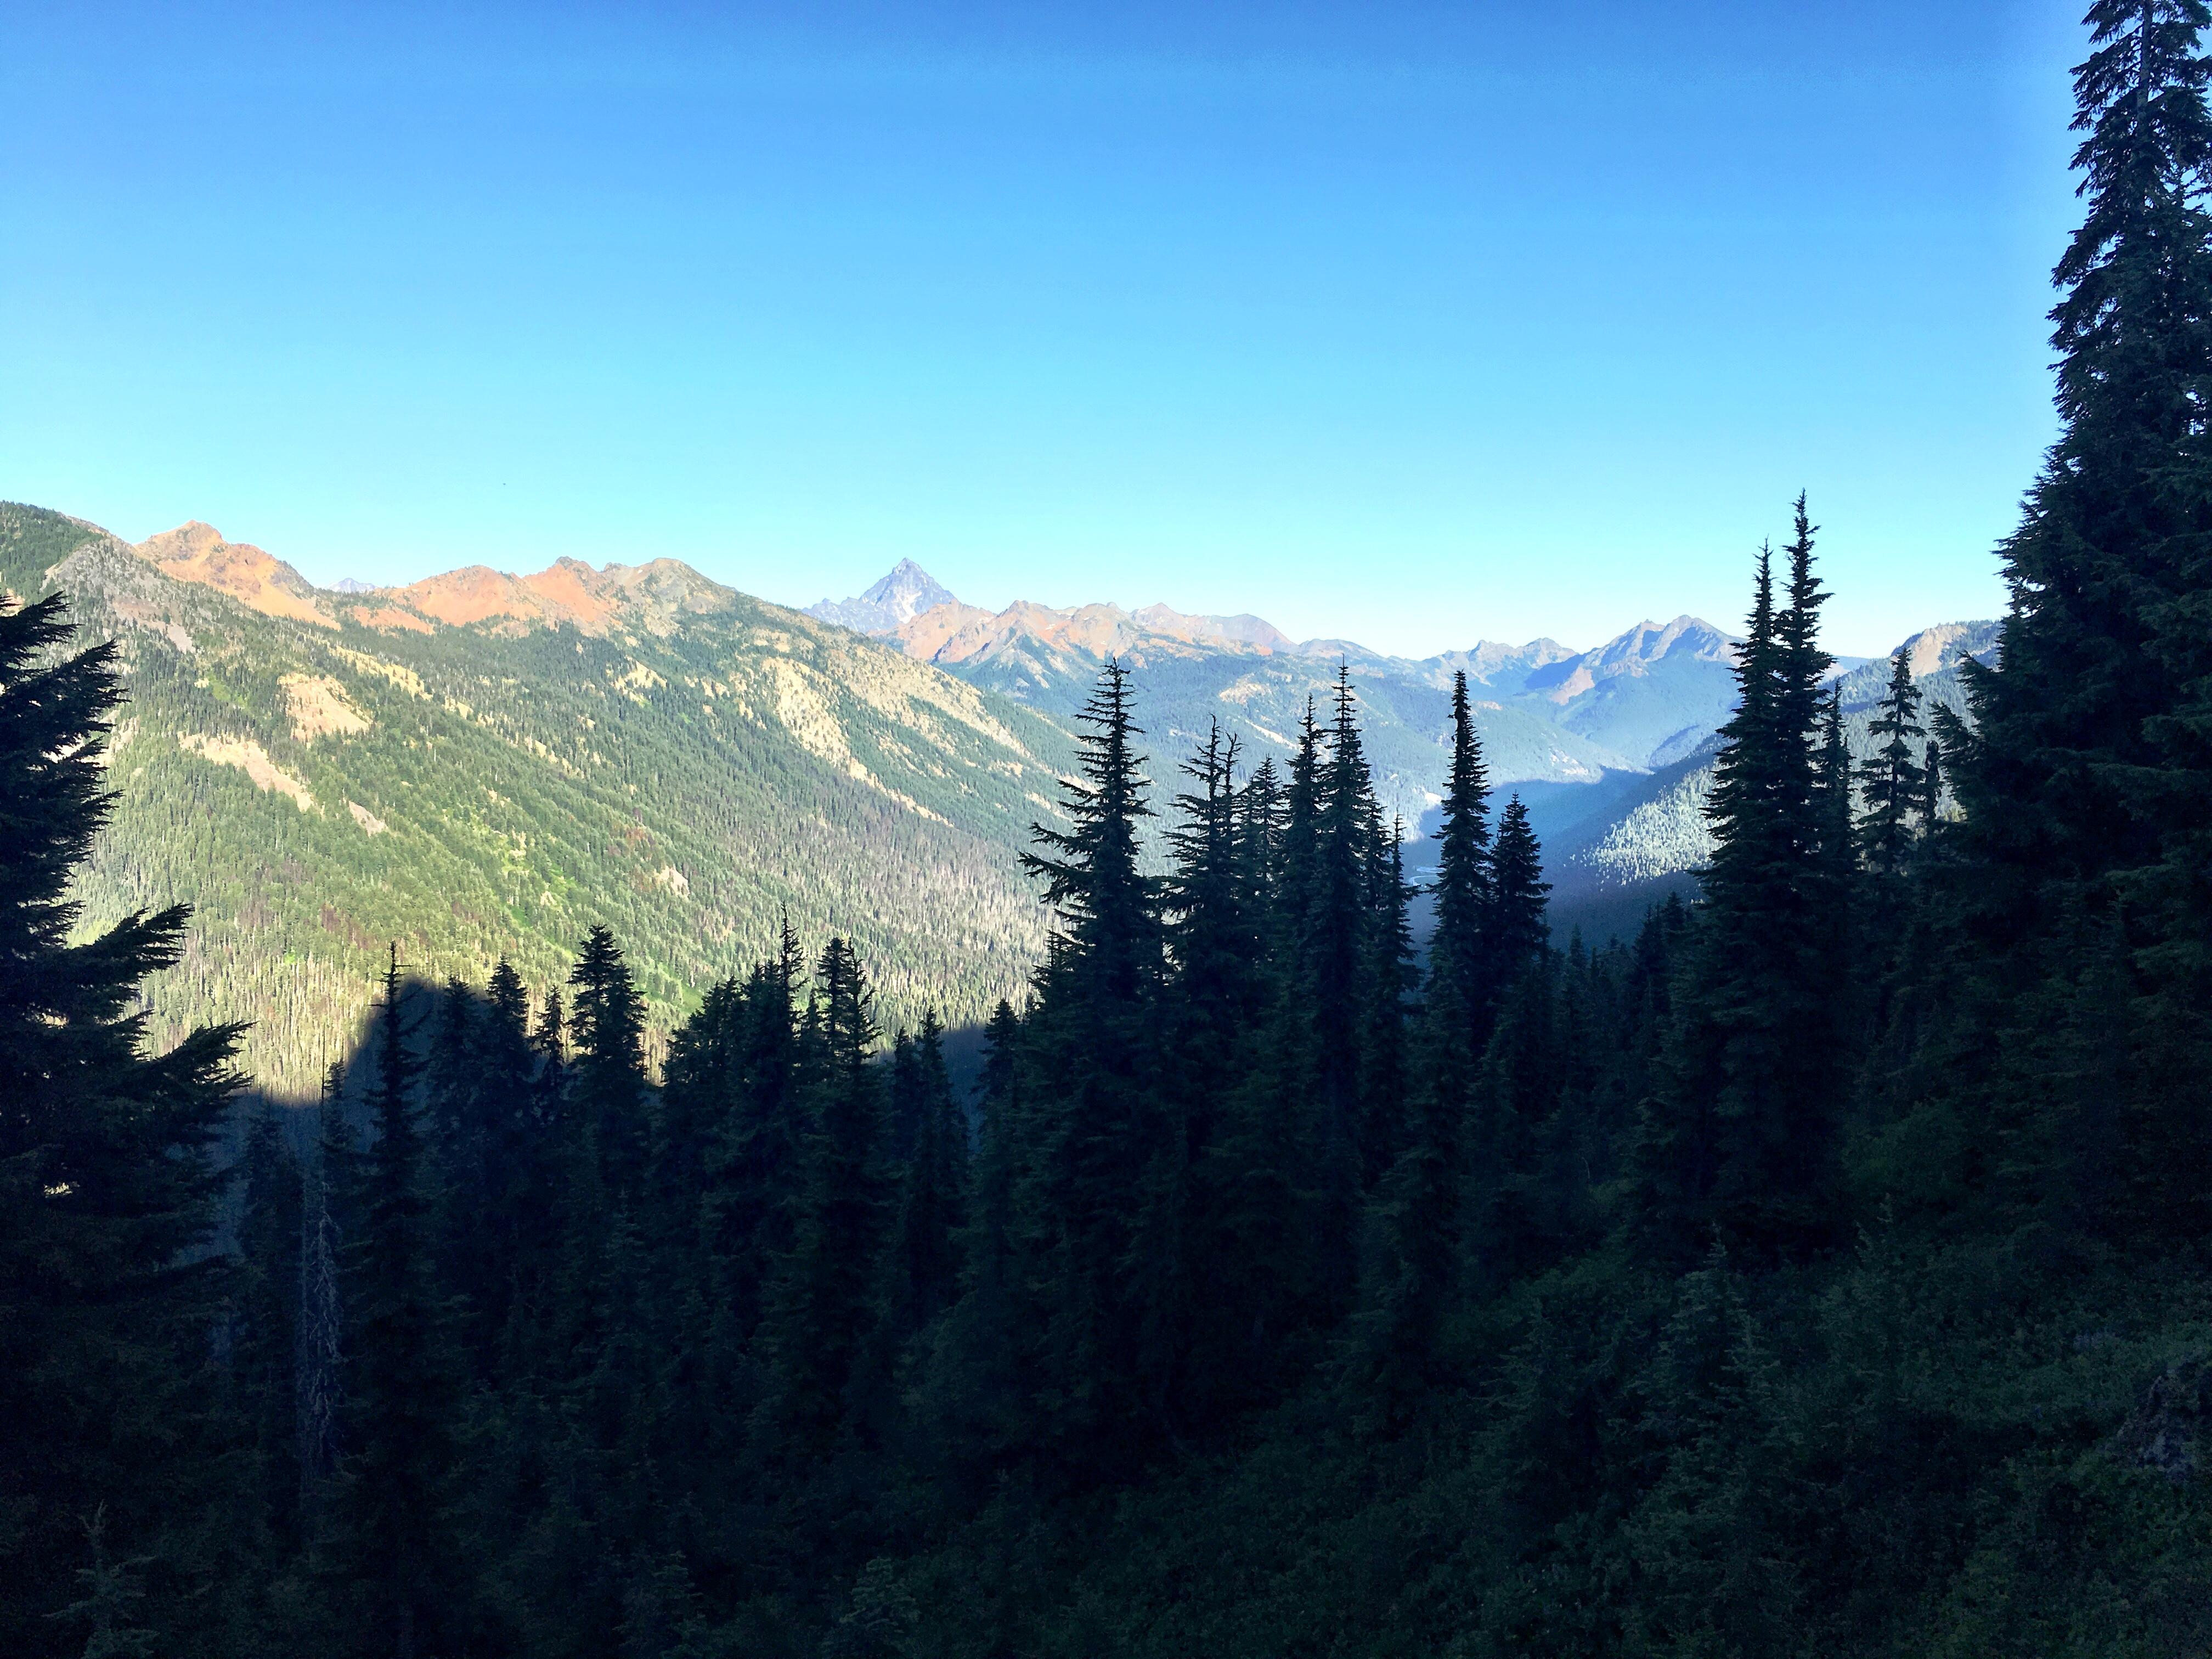 Mountain Views on Stevens Pass to Snoqualmie Pass Adventure